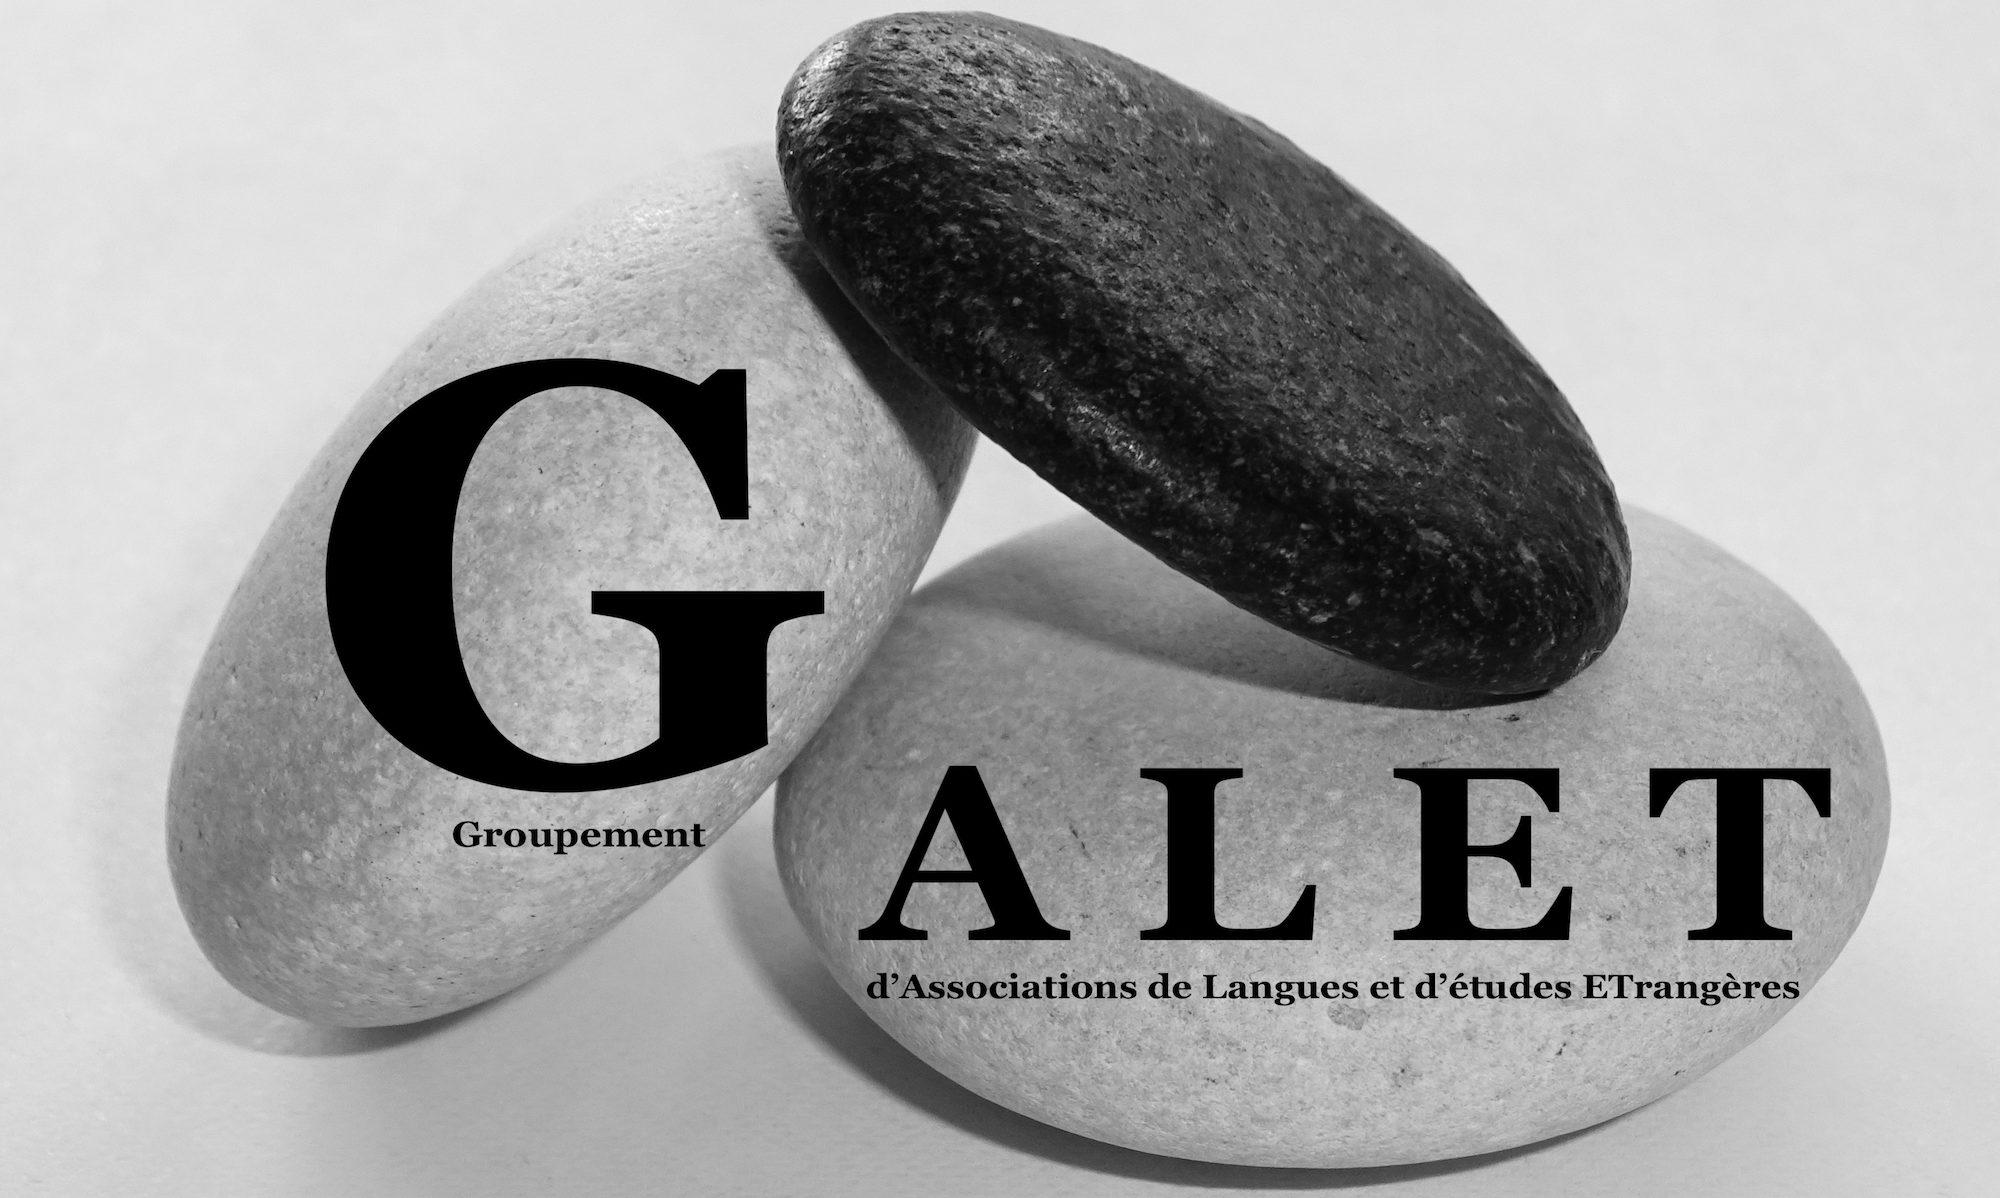 Le GALET